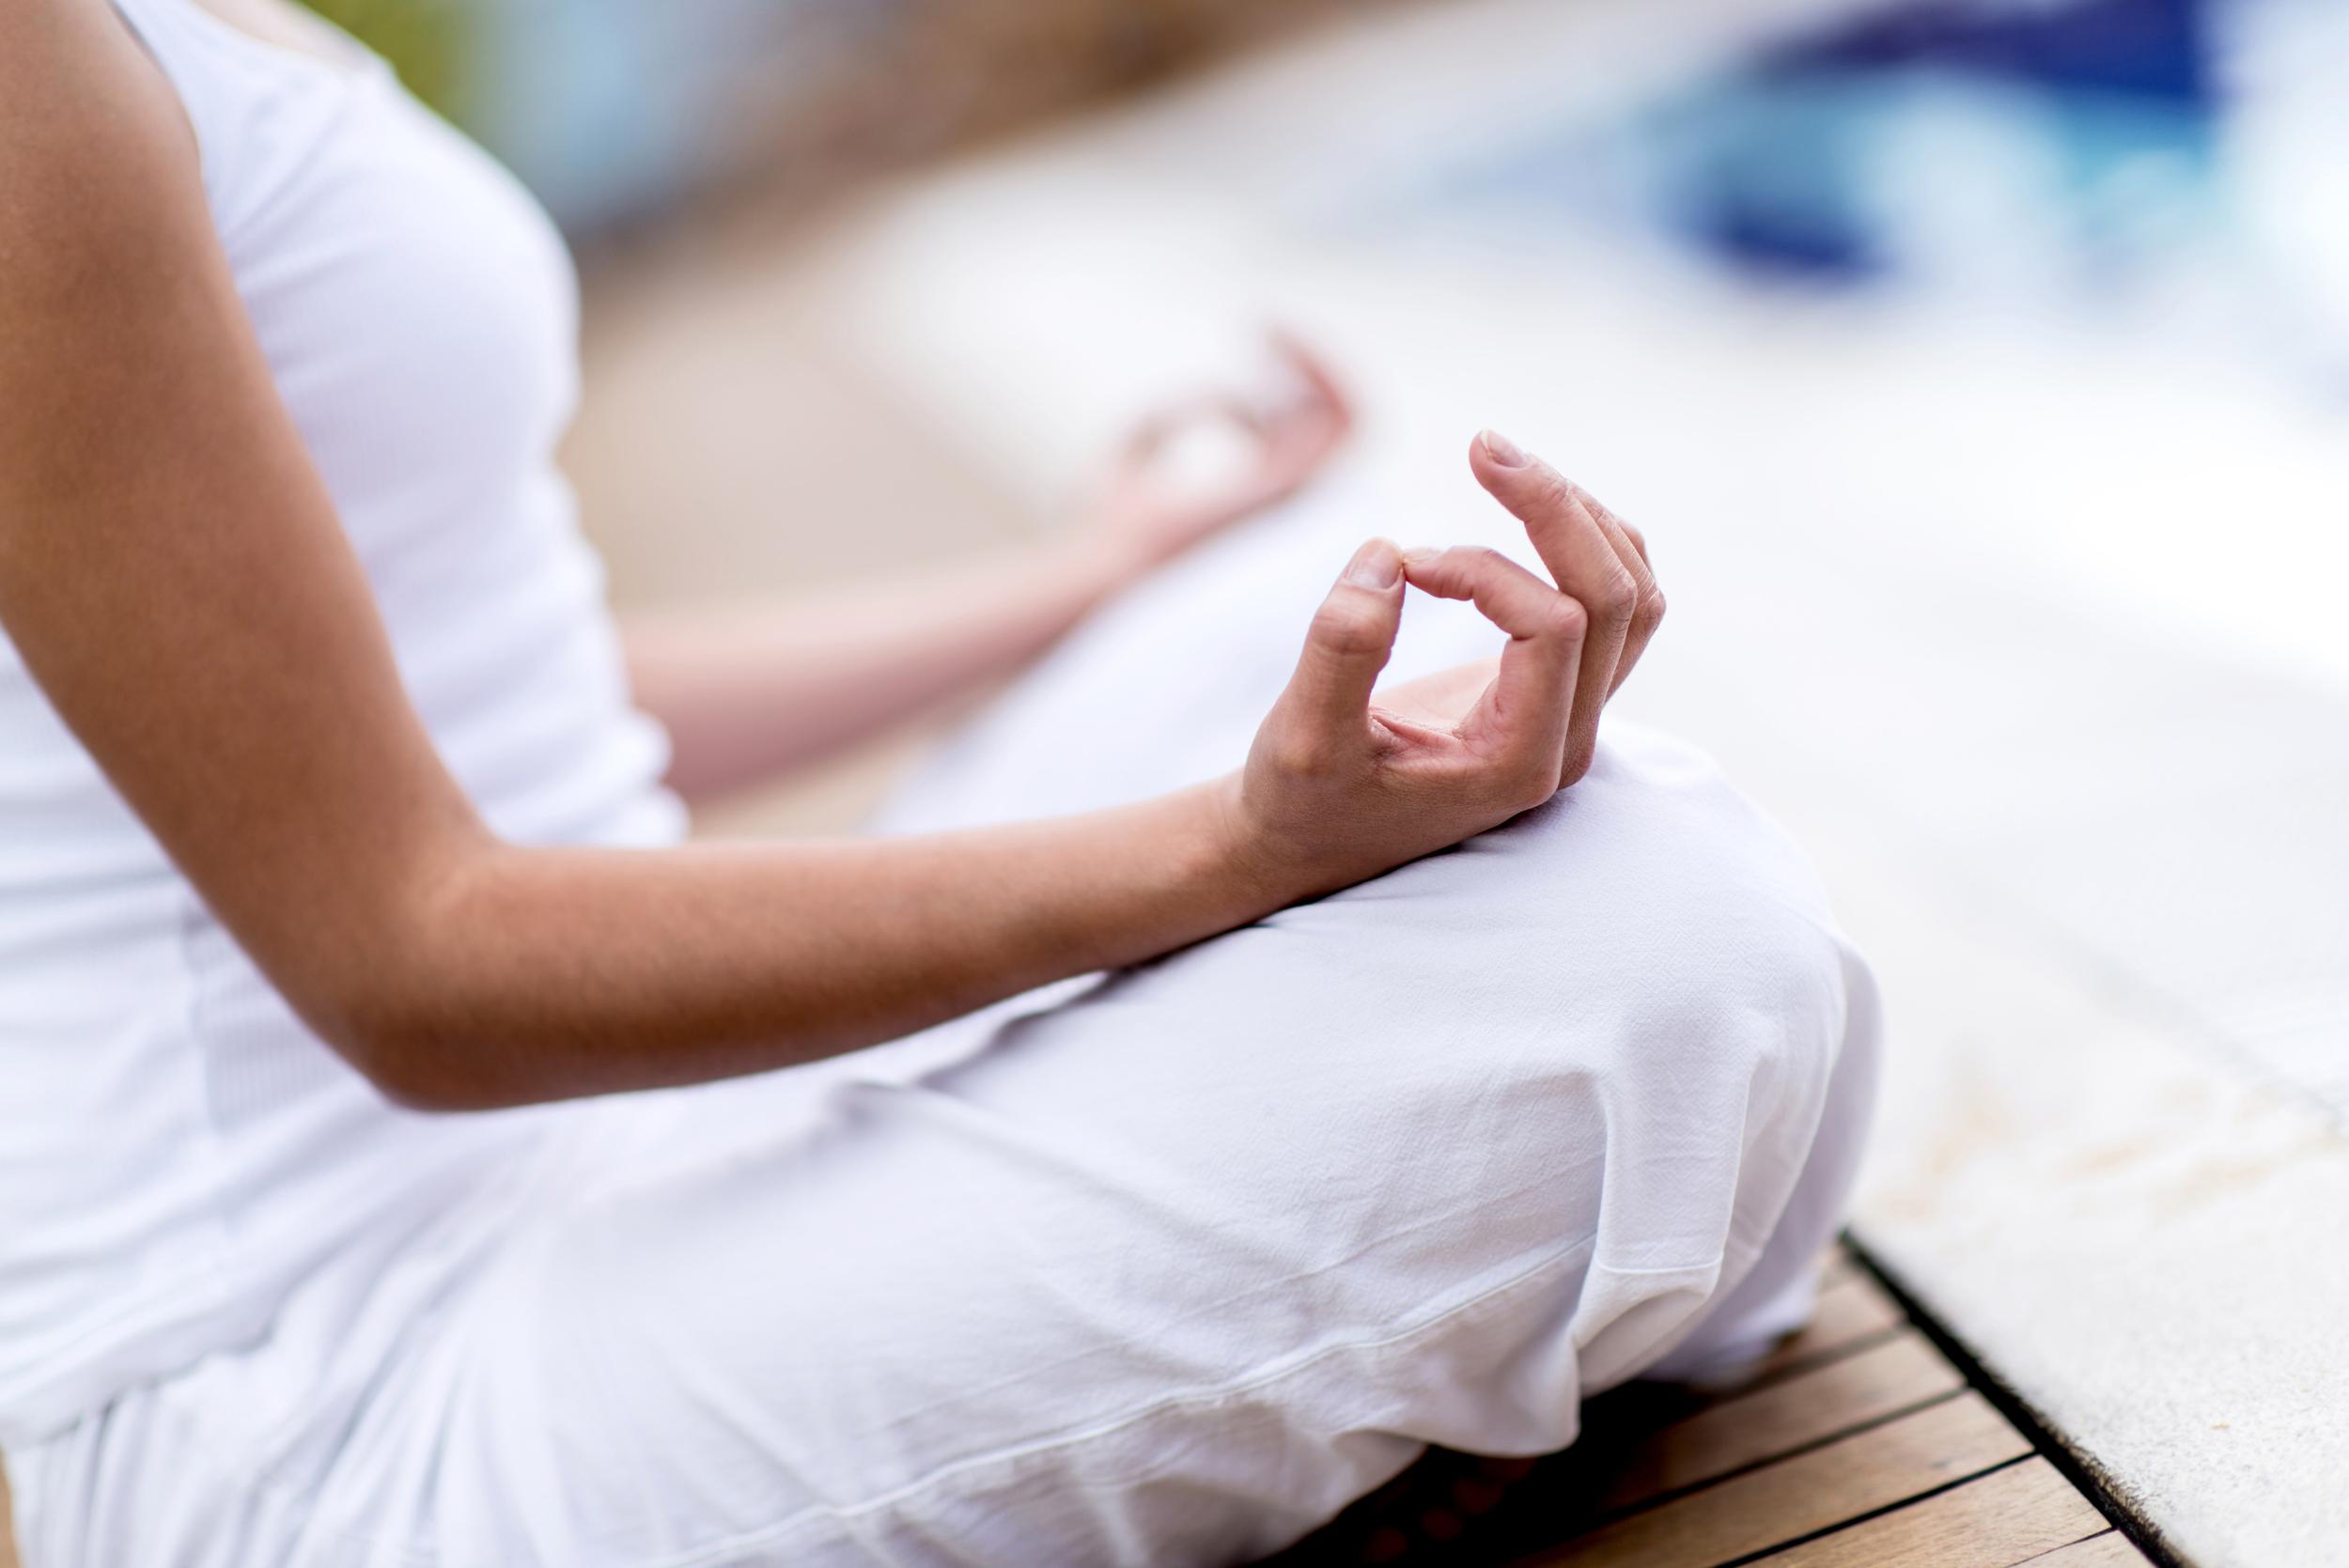 bigstock-Yoga-woman-meditating-and-maki-46483552.jpg